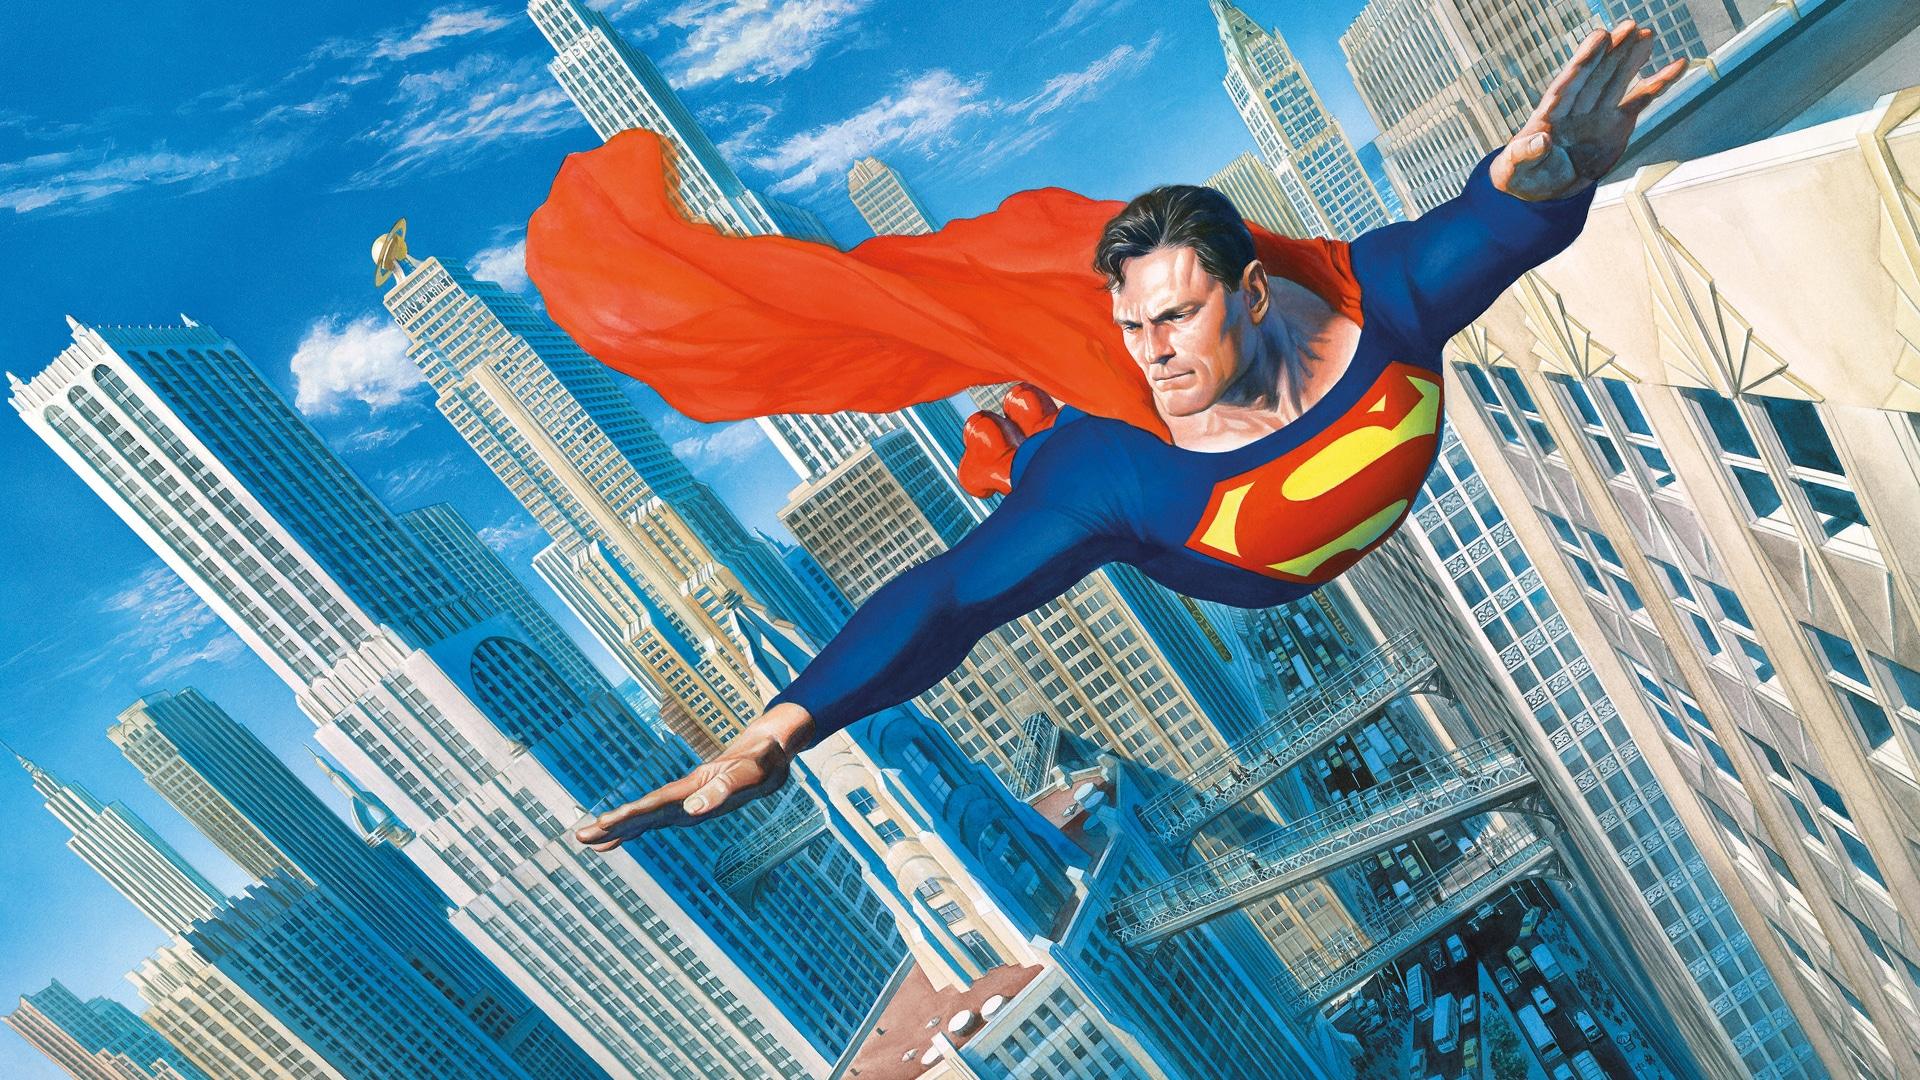 Superman v meste MetropolisSuperman v meste Metropolis